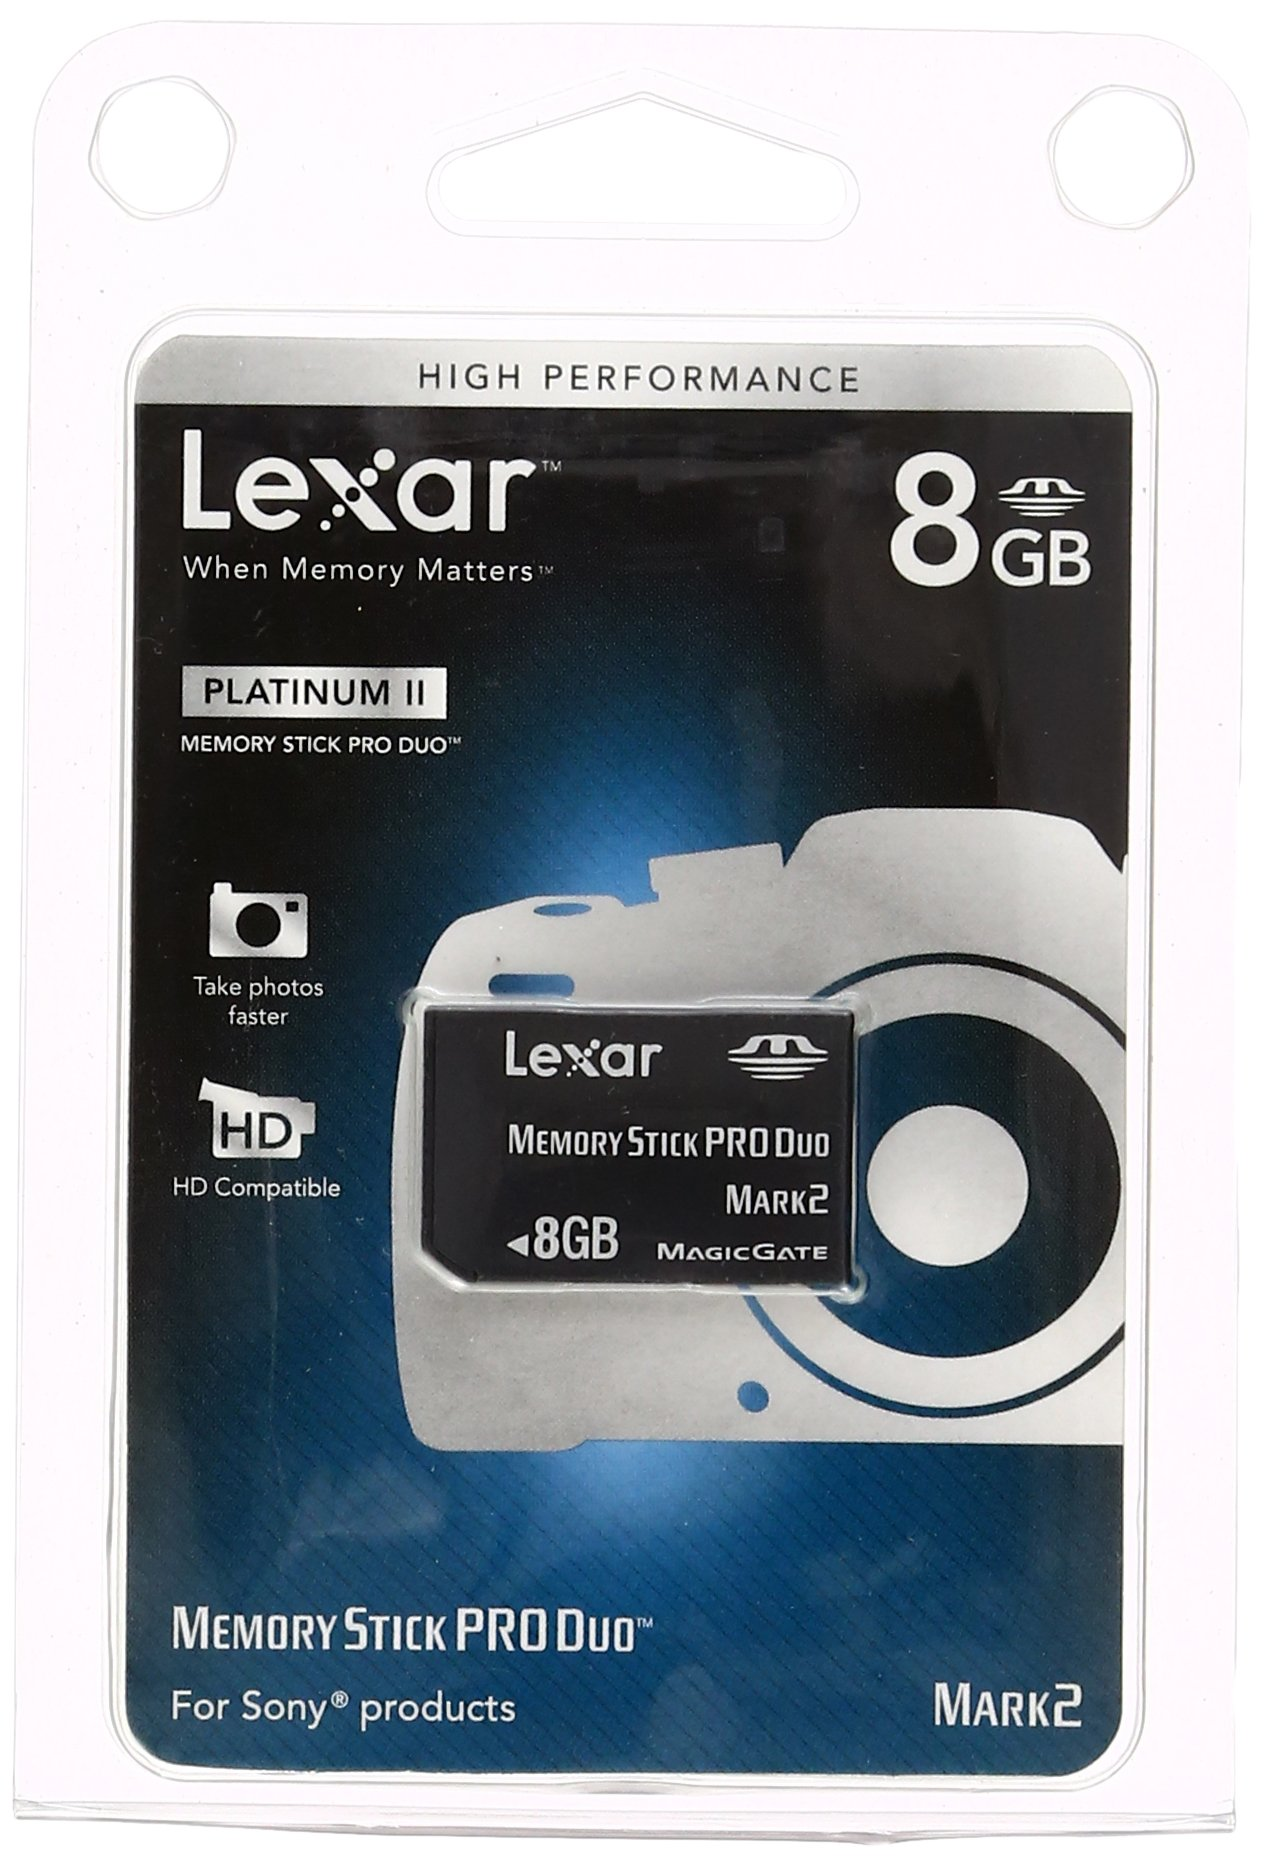 Lexar Platinum II 8GB Memory Stick PRO Duo Memory Card by Lexar